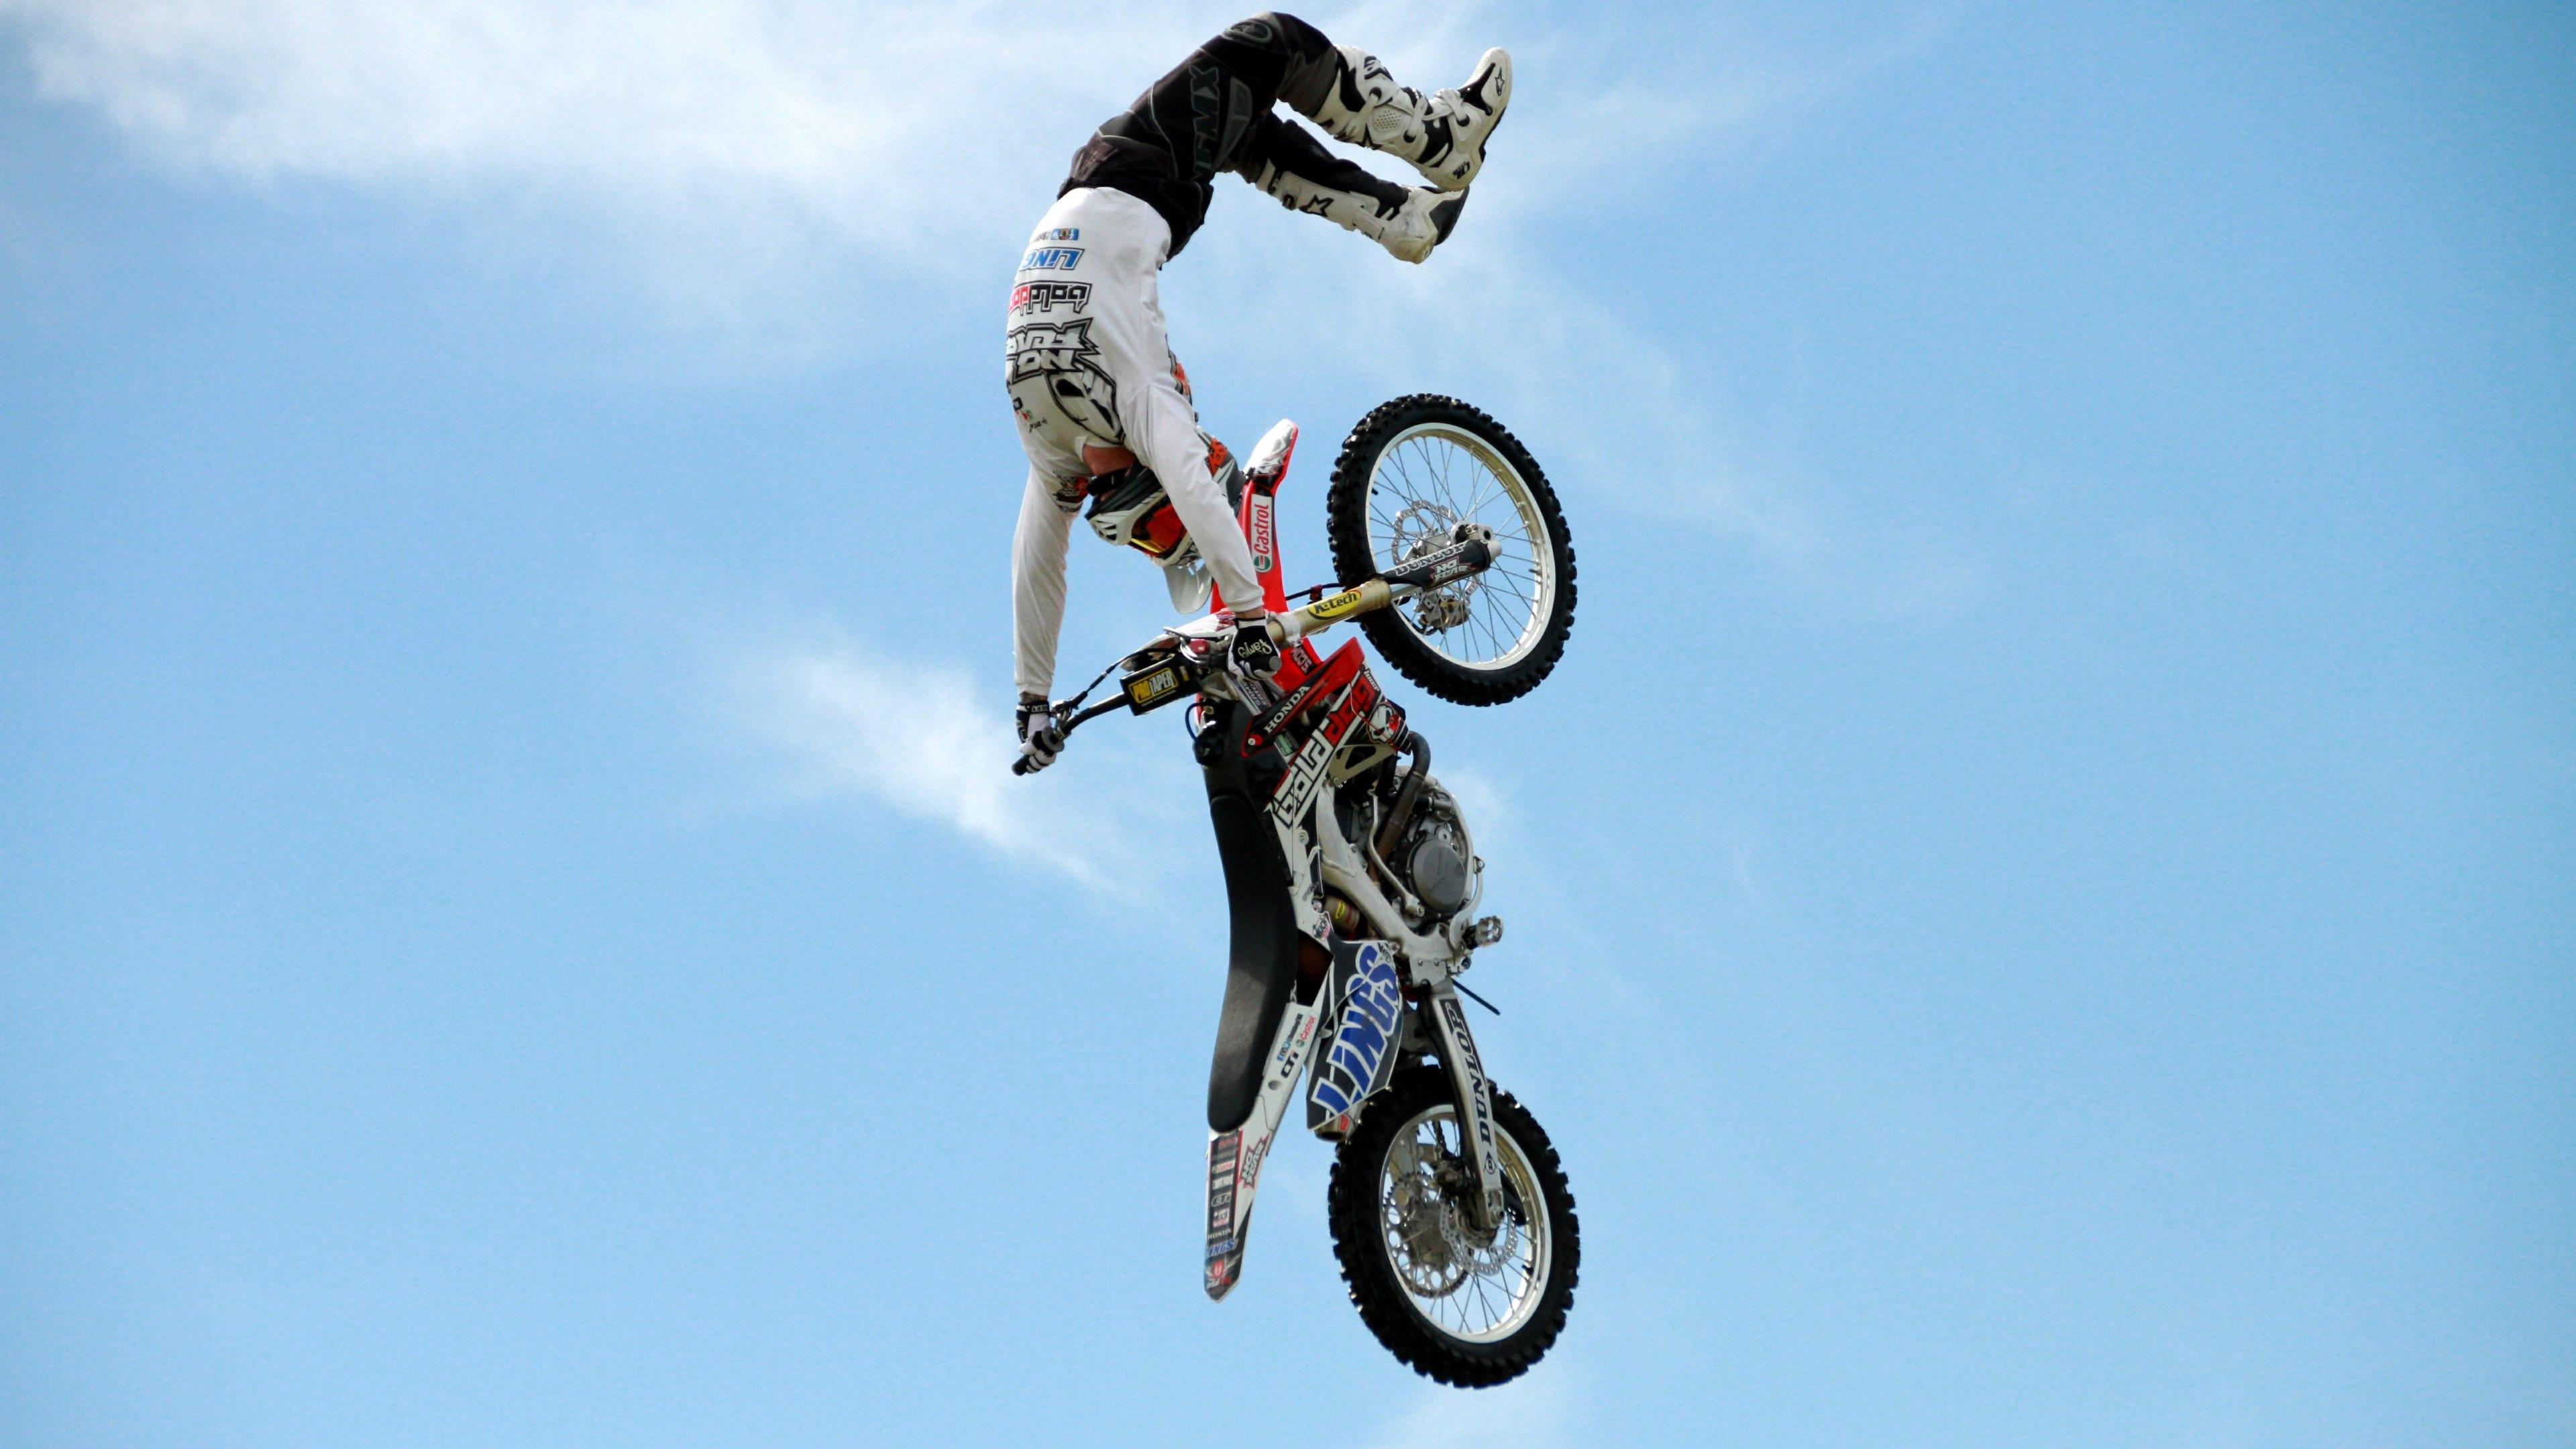 Motocross: Bike, Honda, Motocross, Acrobatics